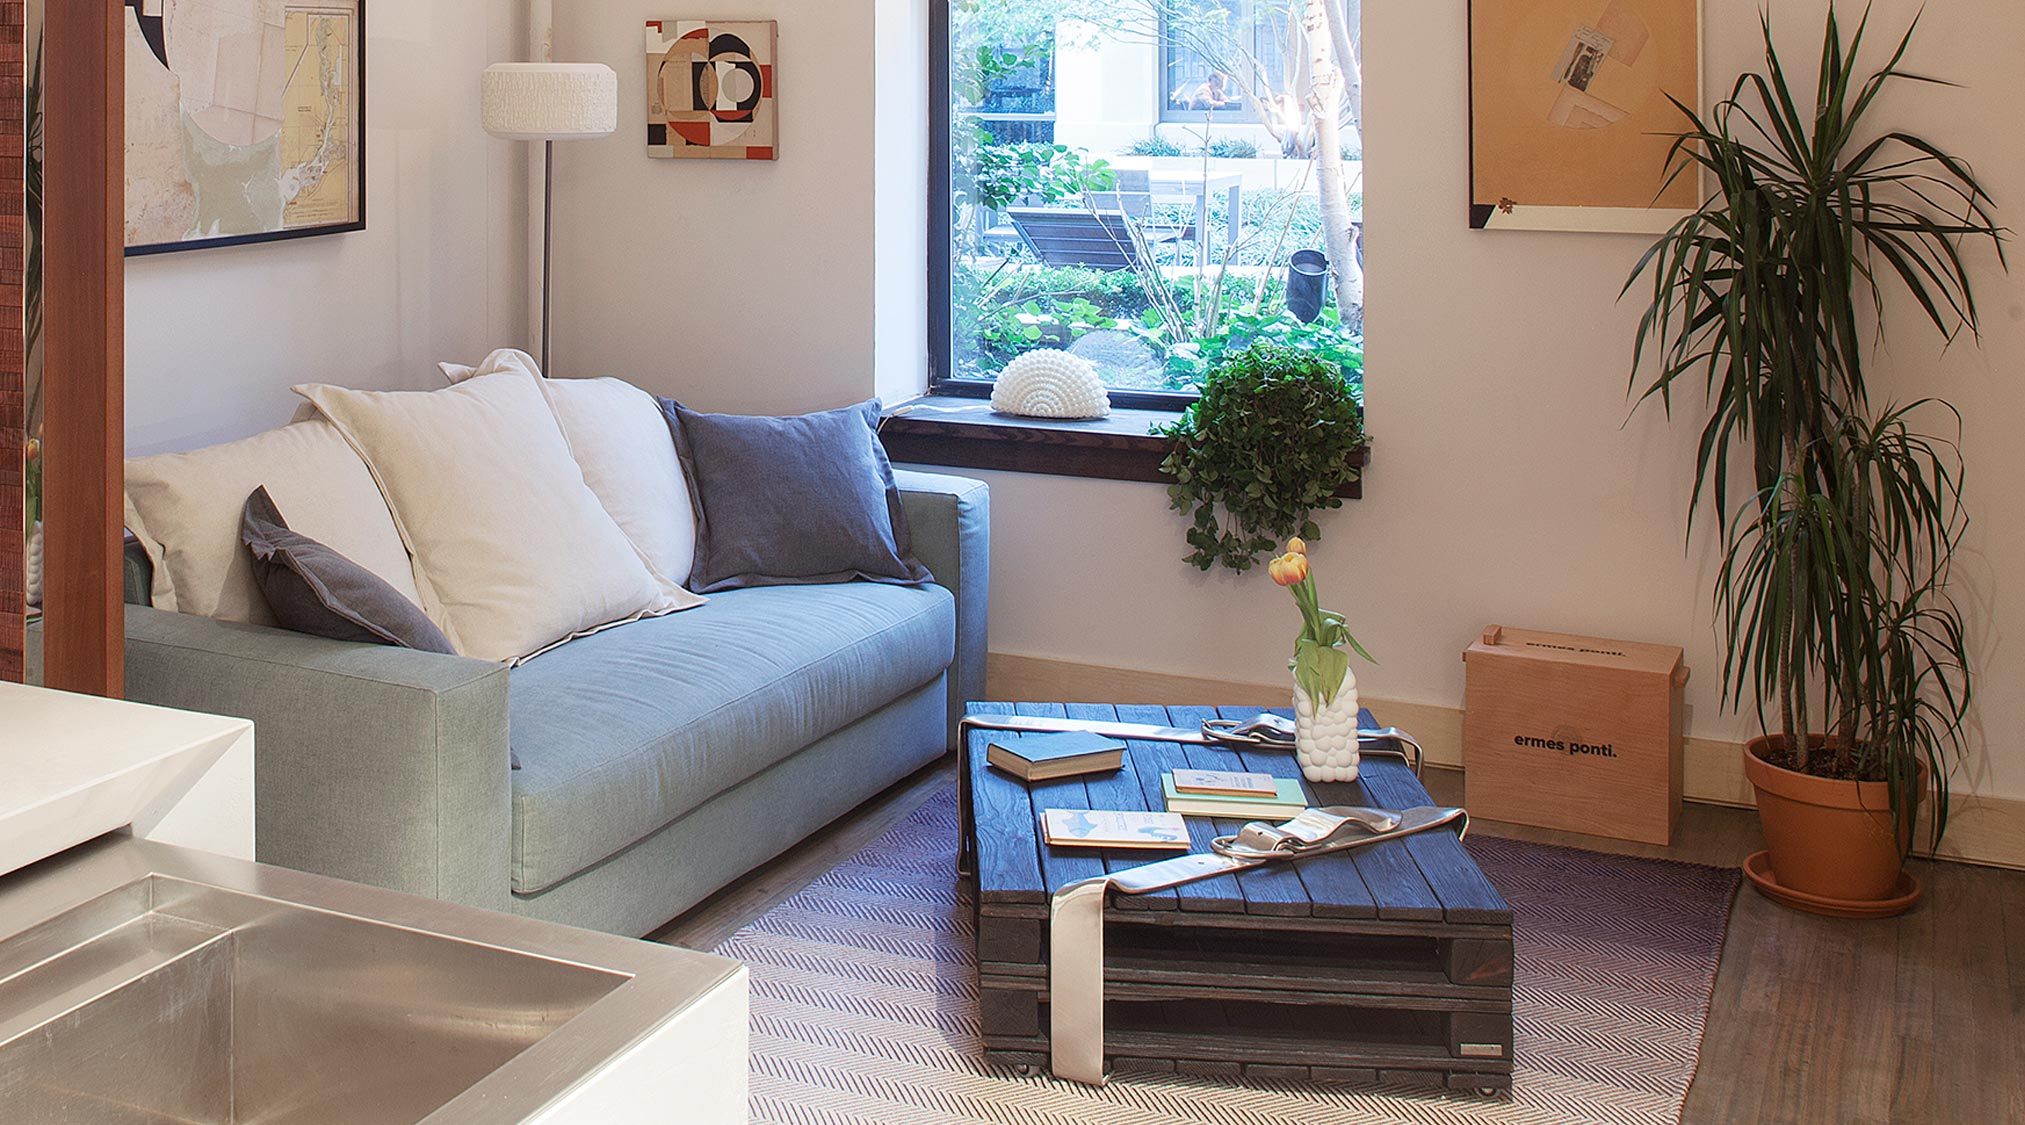 Divano letto Passepartout - Showroom Design Apart